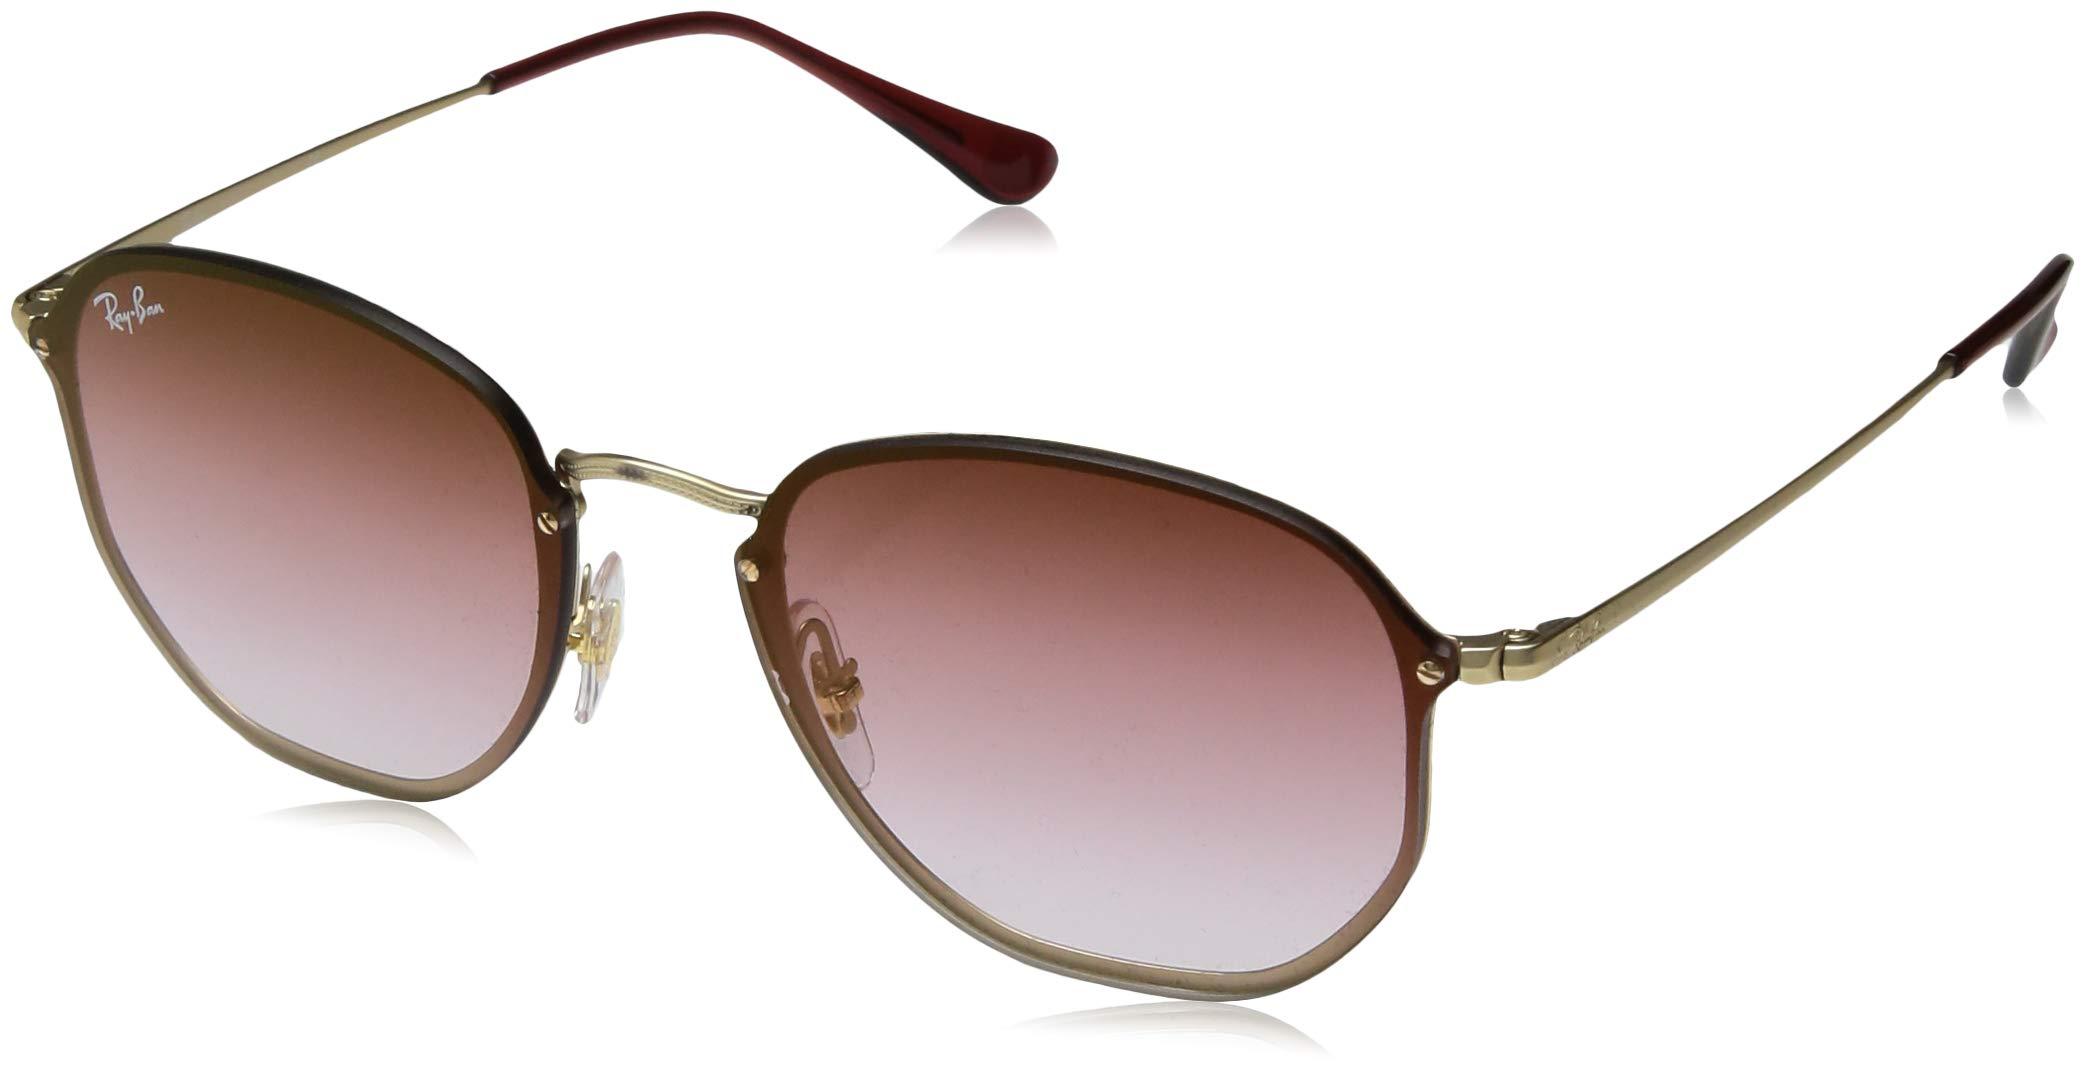 Ray-Ban RB3579N Blaze Hexagonal Sunglasses, Gold Demigloss/Dark Red Gradient Mirror, 58 mm